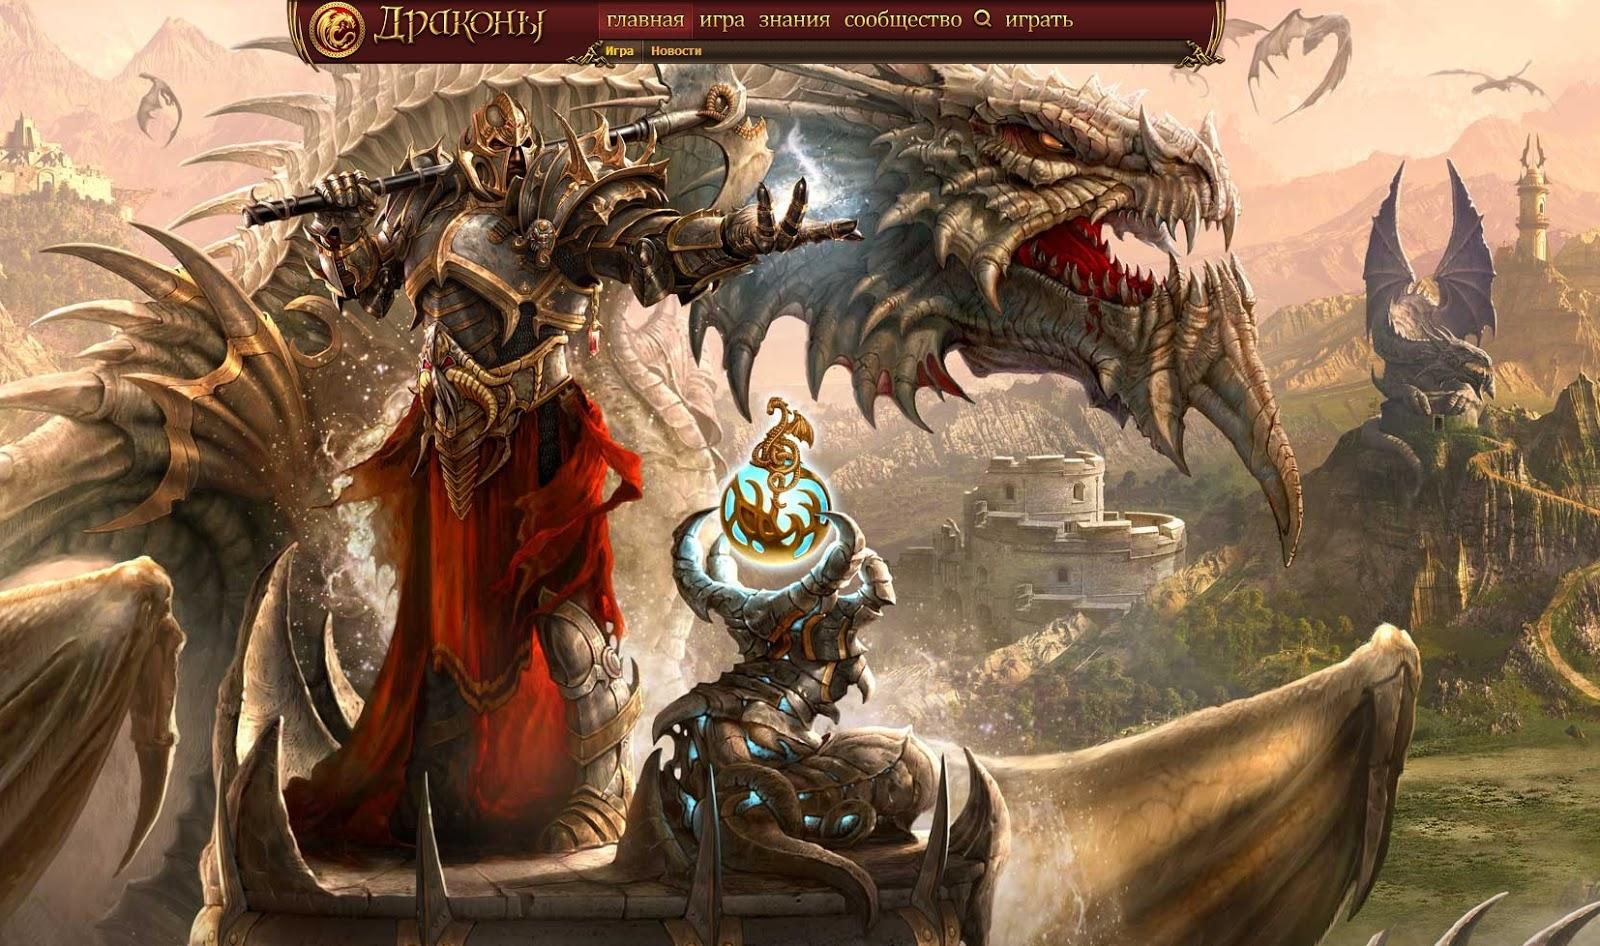 Драконы - первая кроссплатформенная MMORPG от Game Insight.